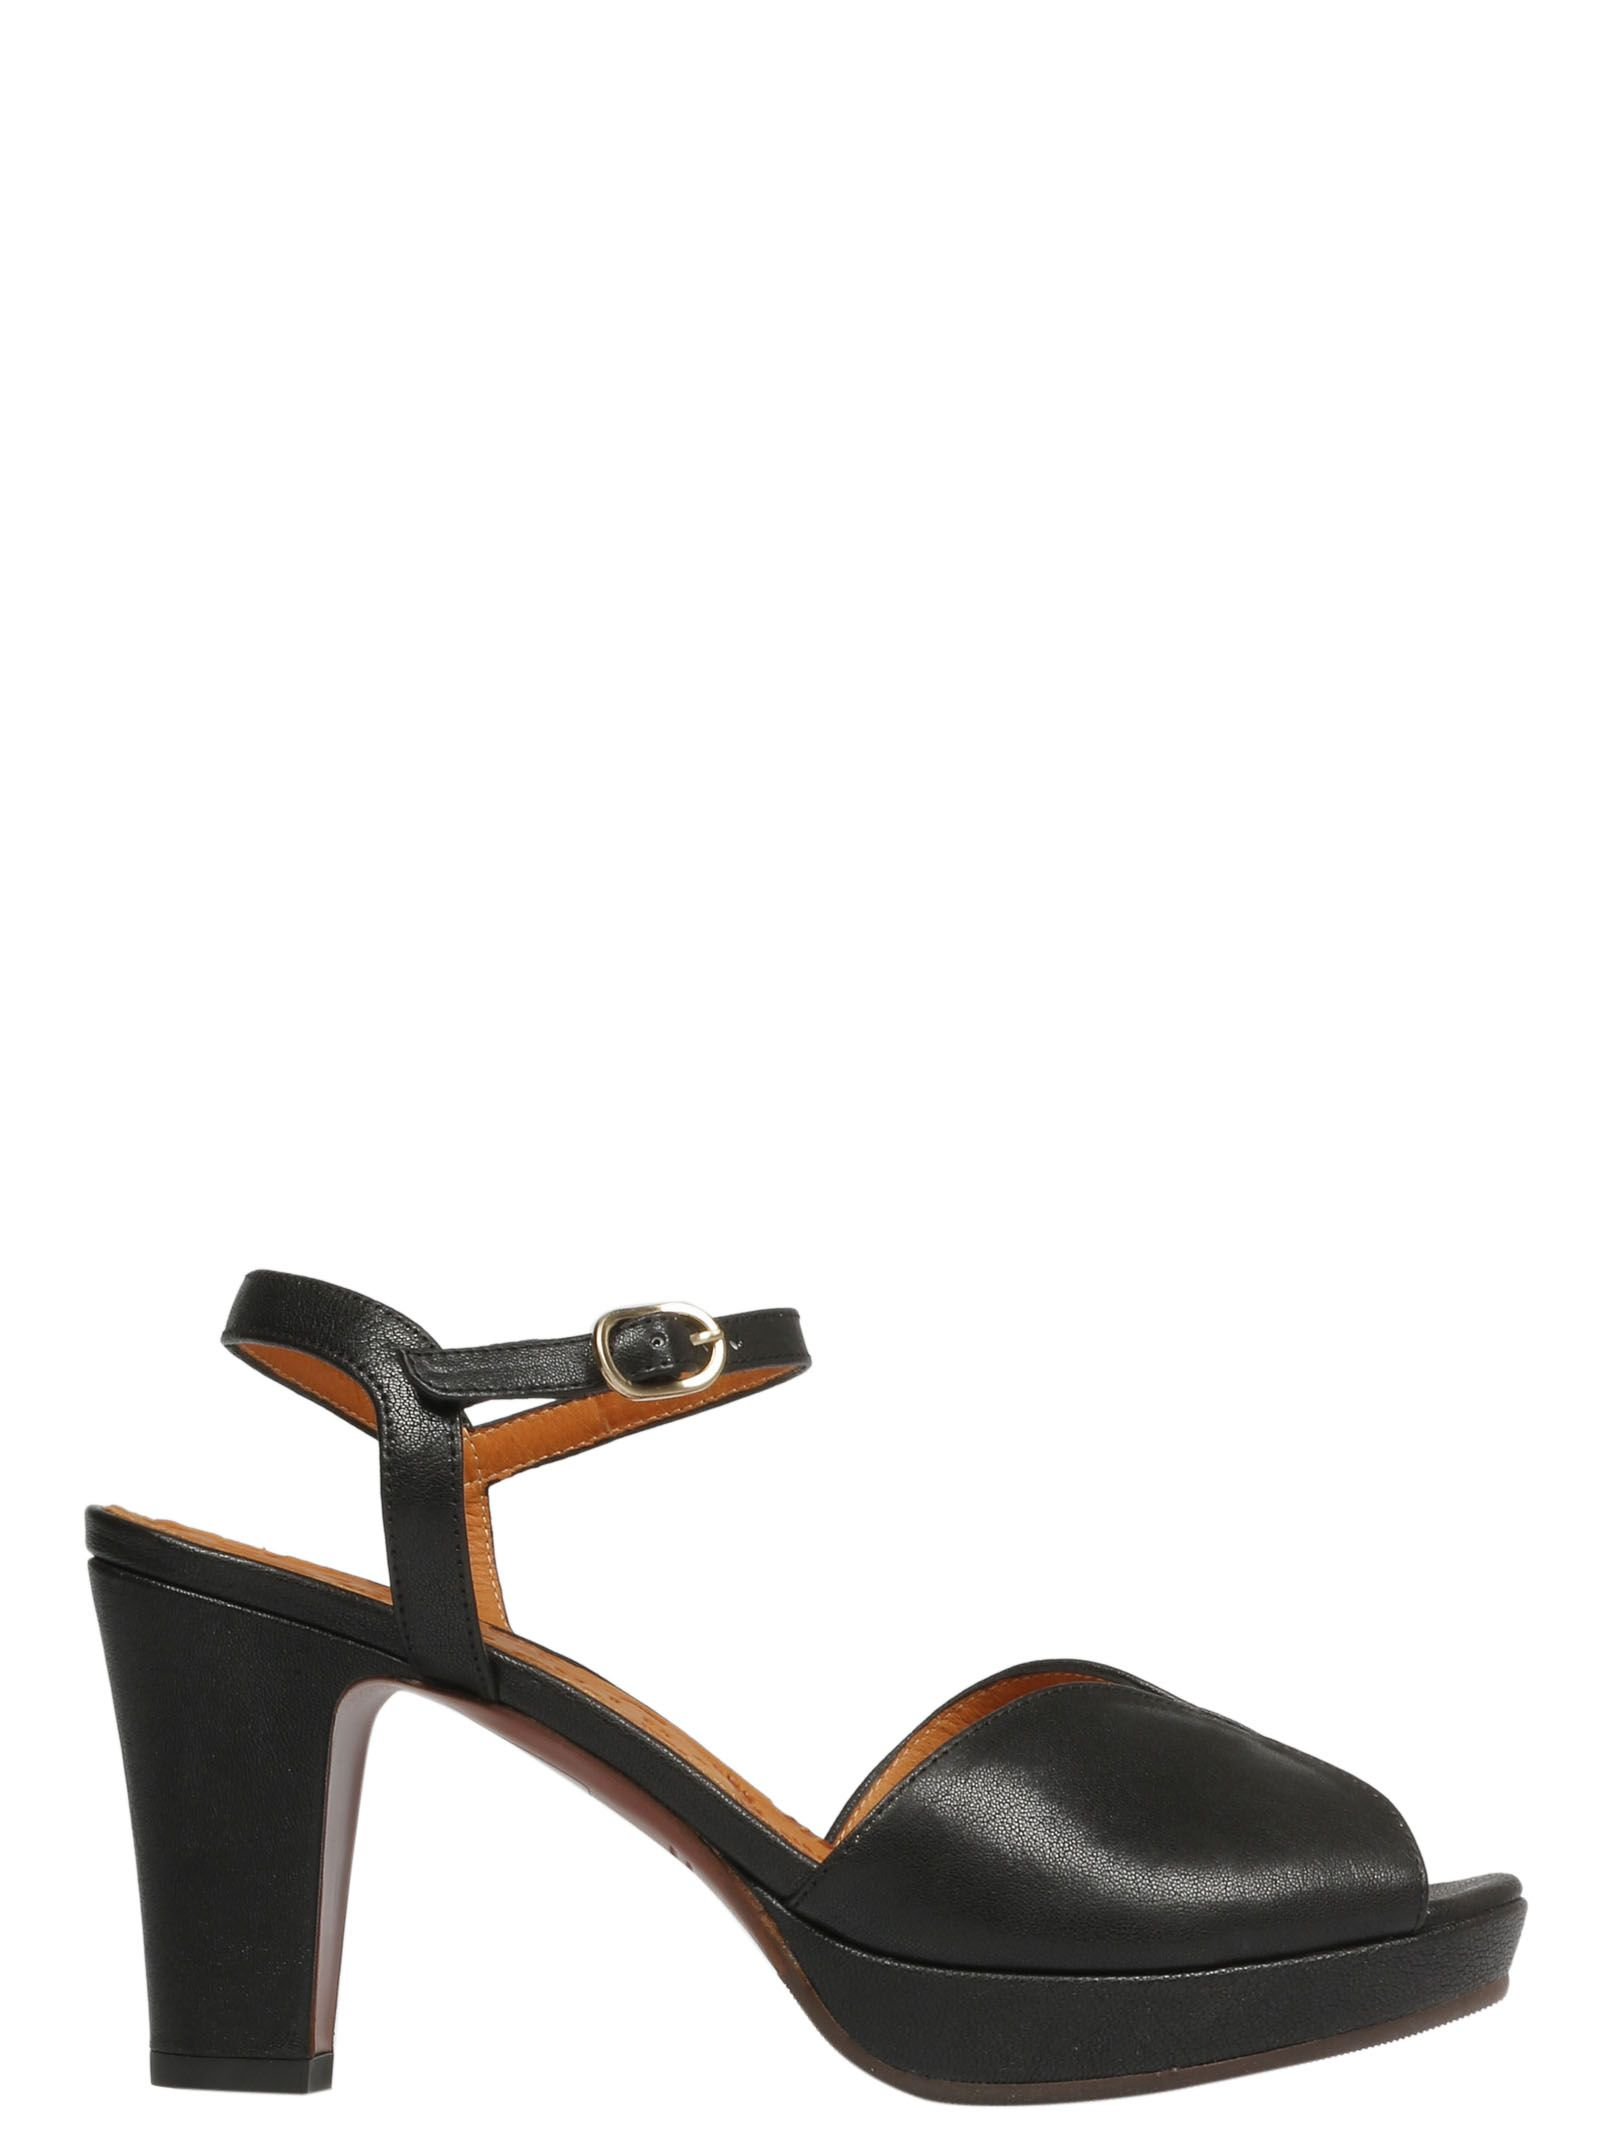 3899af7616f Chie Mihara Chie Mihara Elodea Platform Sandals - Basic - 10853389 ...